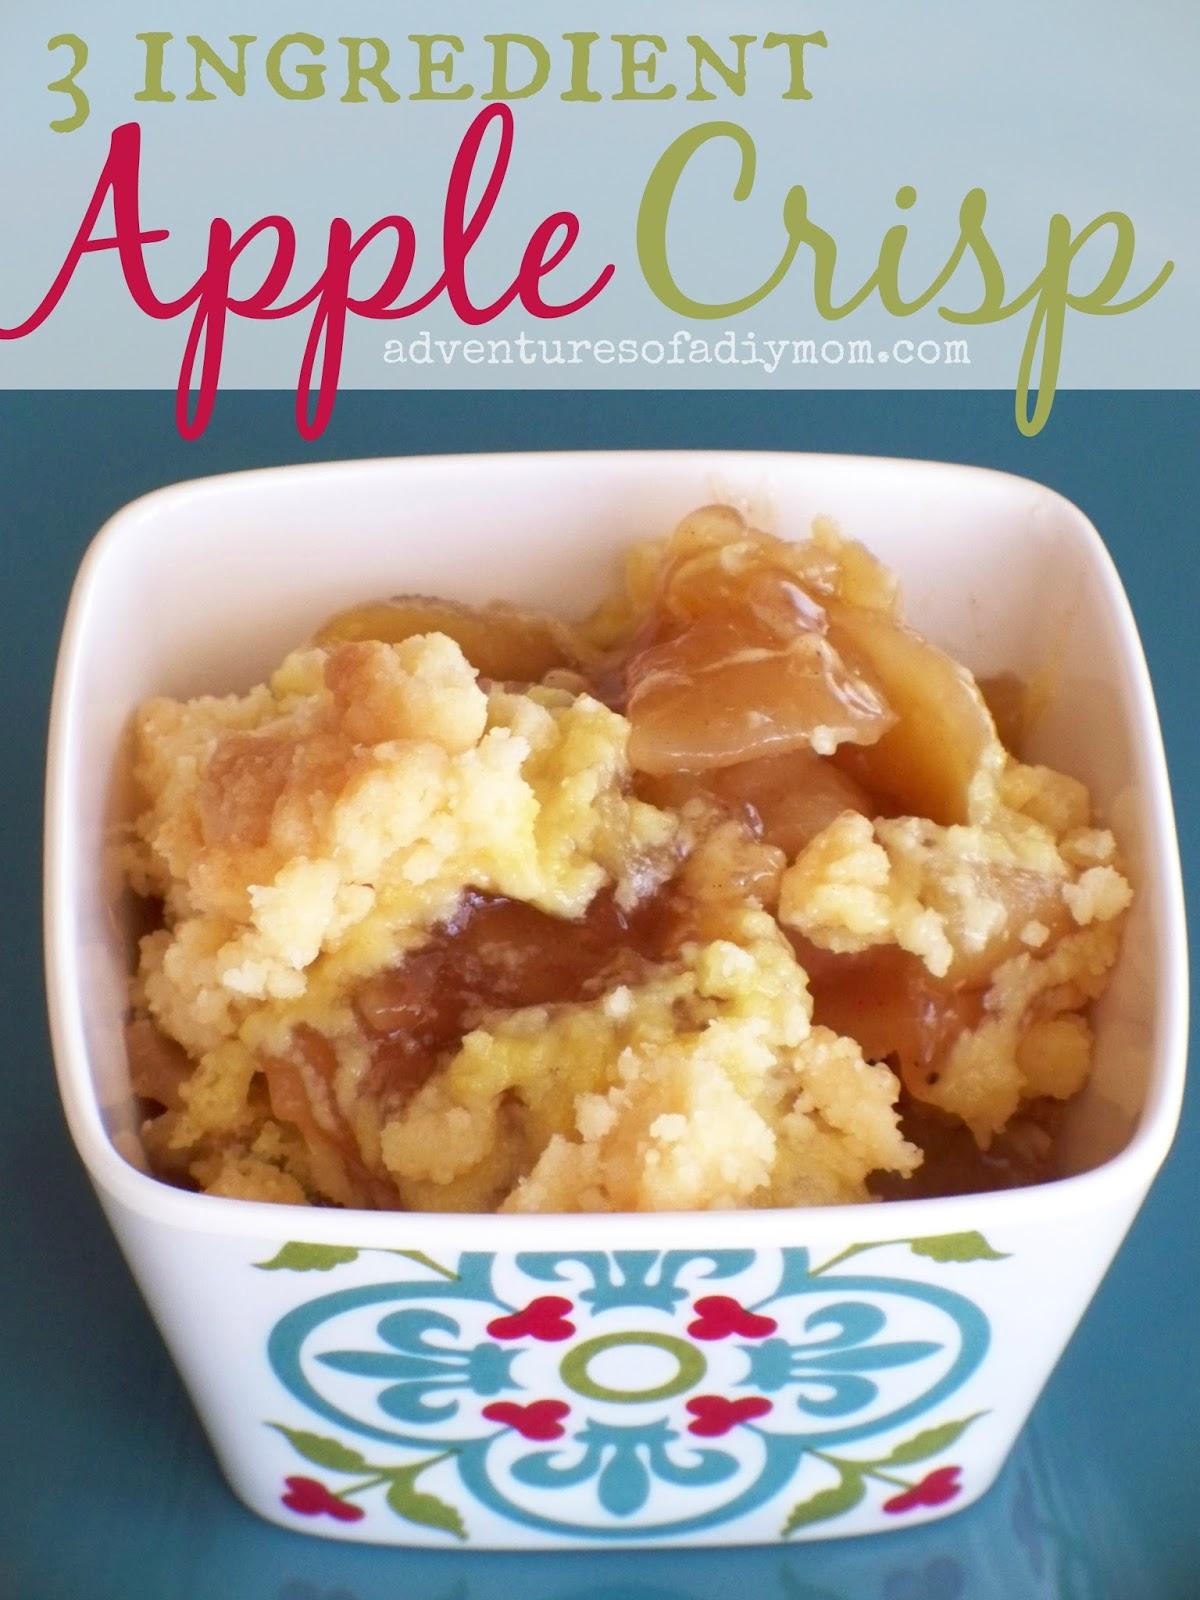 3 Ingredient Apple Crisp